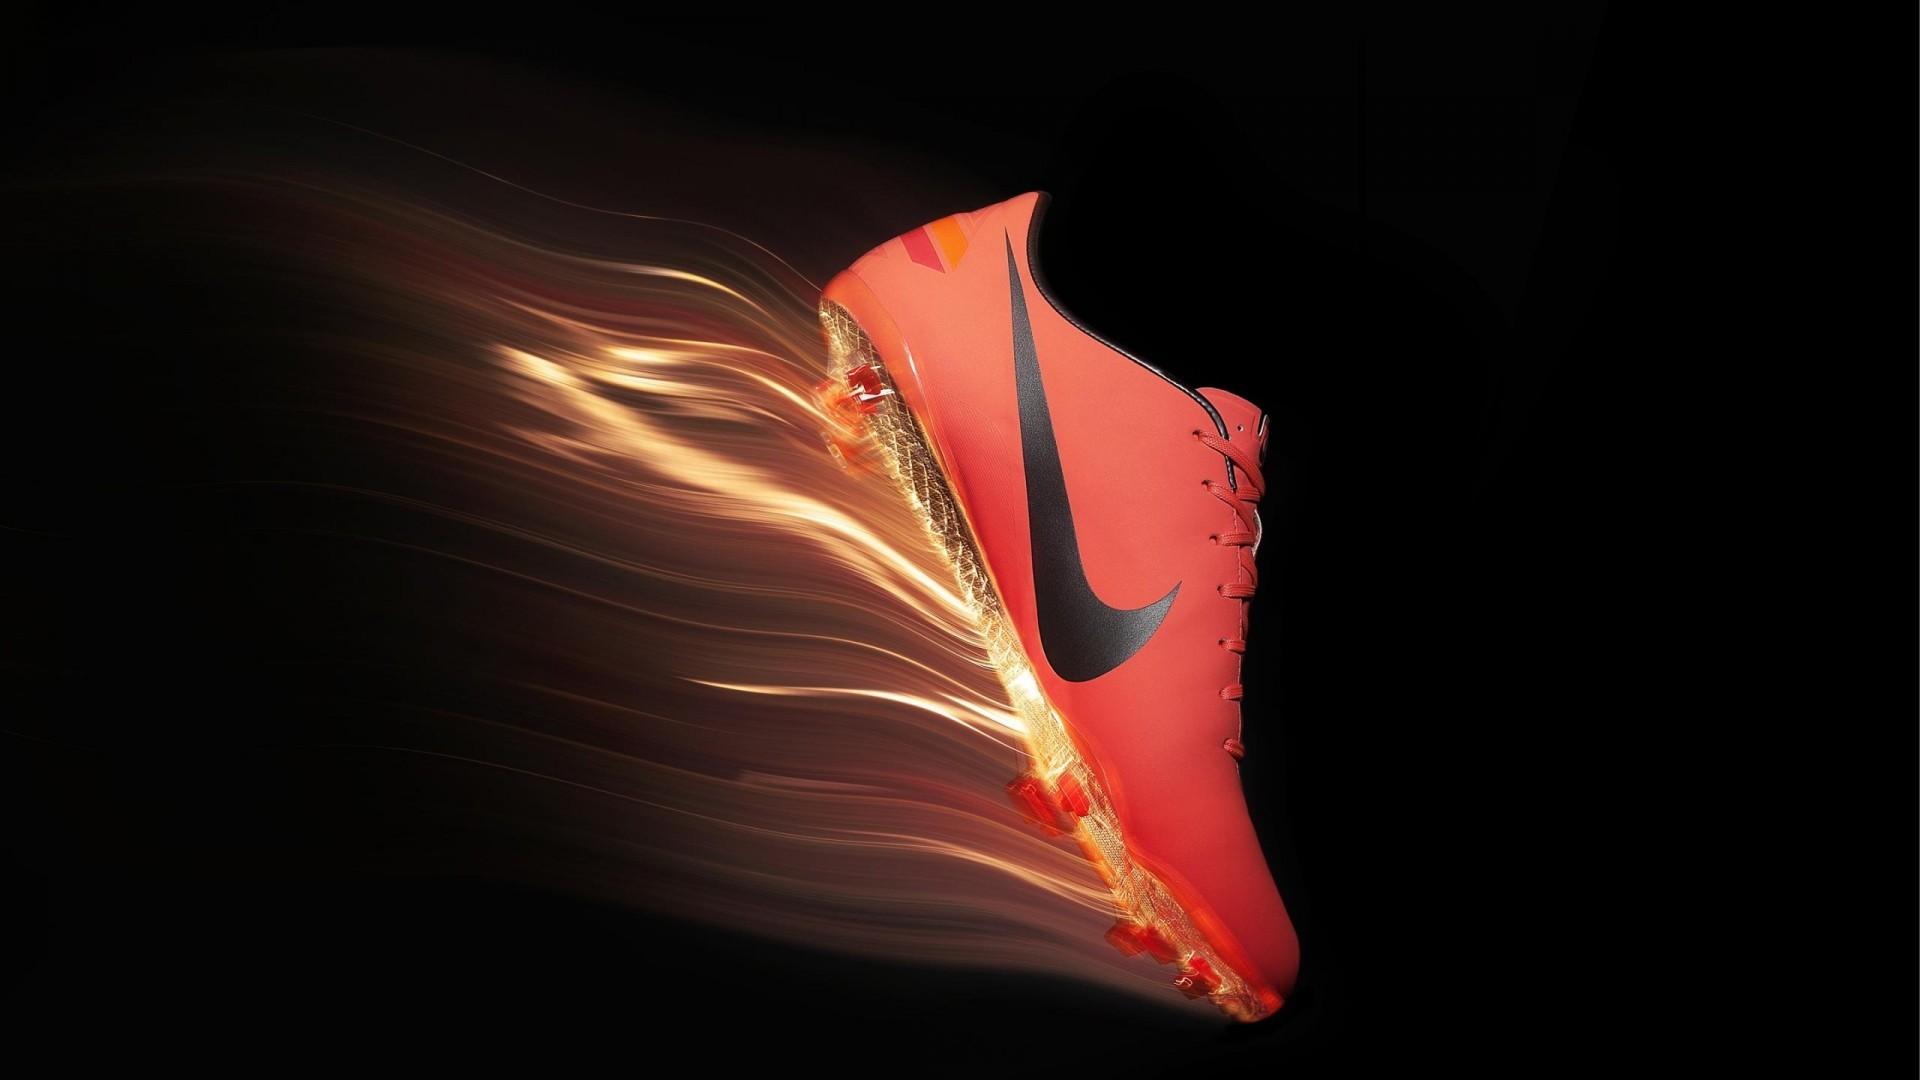 Res: 1920x1080, Red Nike Football Shoes Wallpaper Desktop Wallpaper